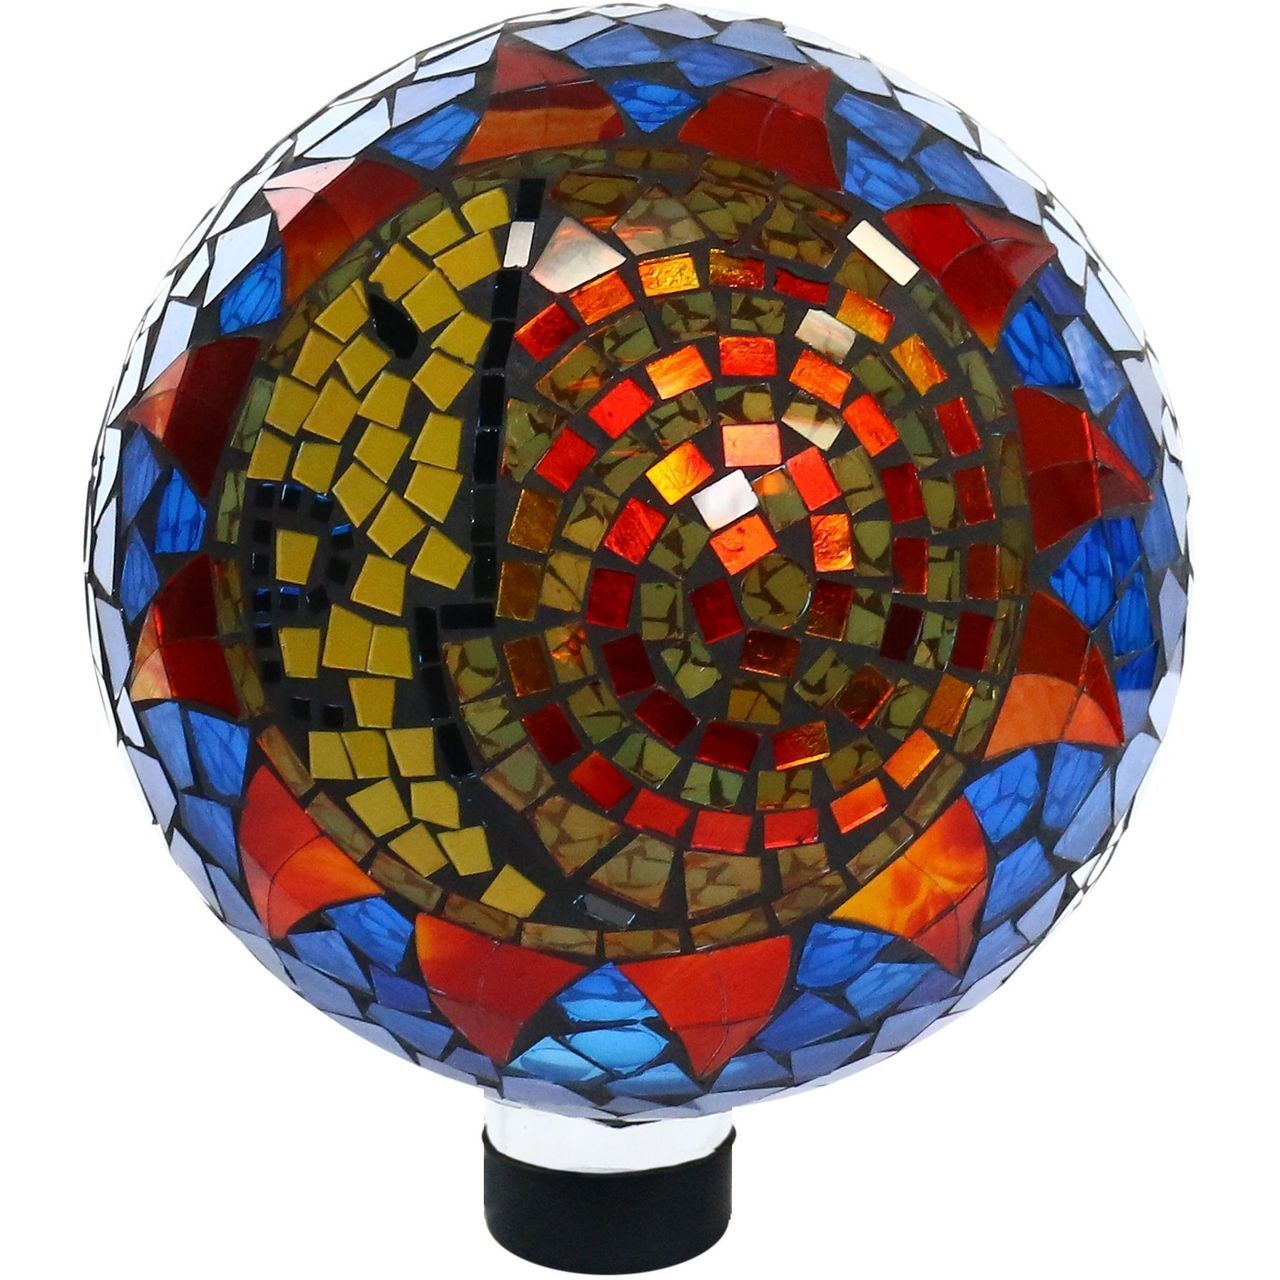 Alpine HGY120 Mosaic Sun and Moon Gazing Globe